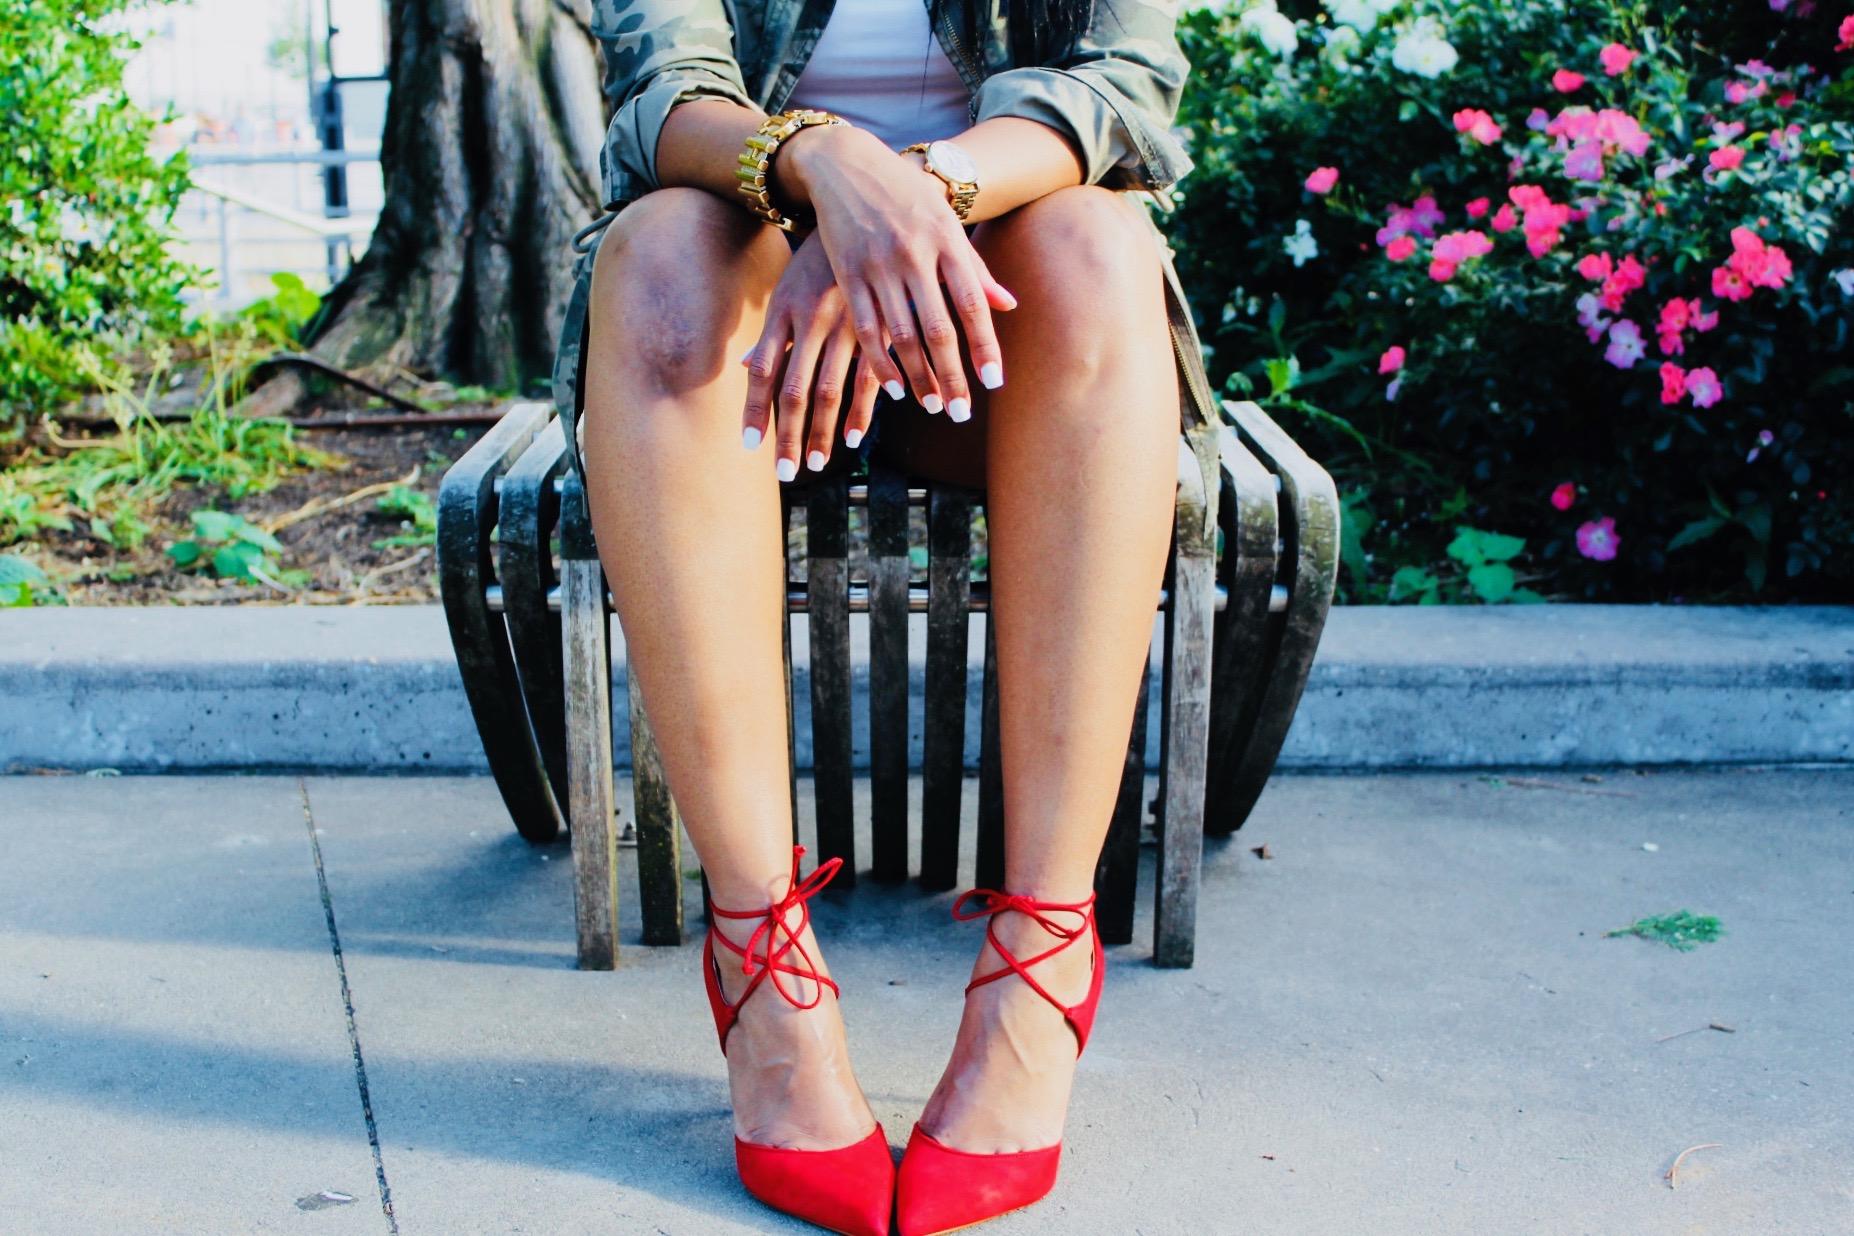 Don't mind my mangled knee. I fall a lot. :-/